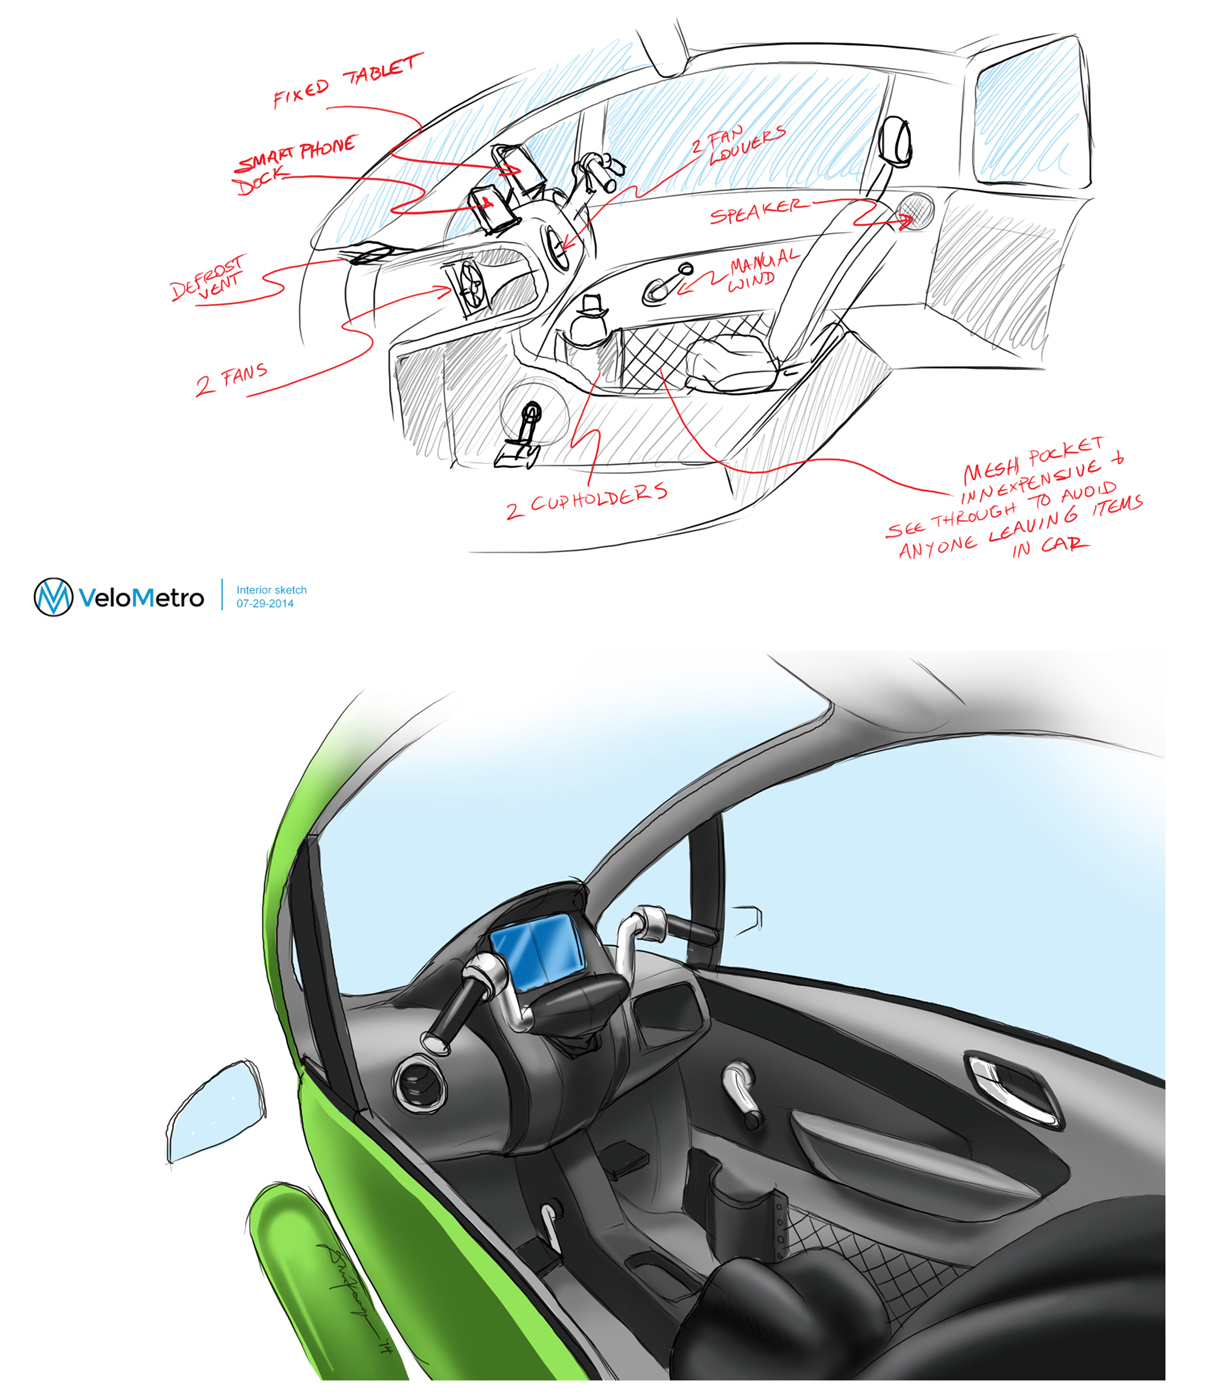 VELOMETRO VEEMO Keage Concepts Calgary Alberta Automotive Design